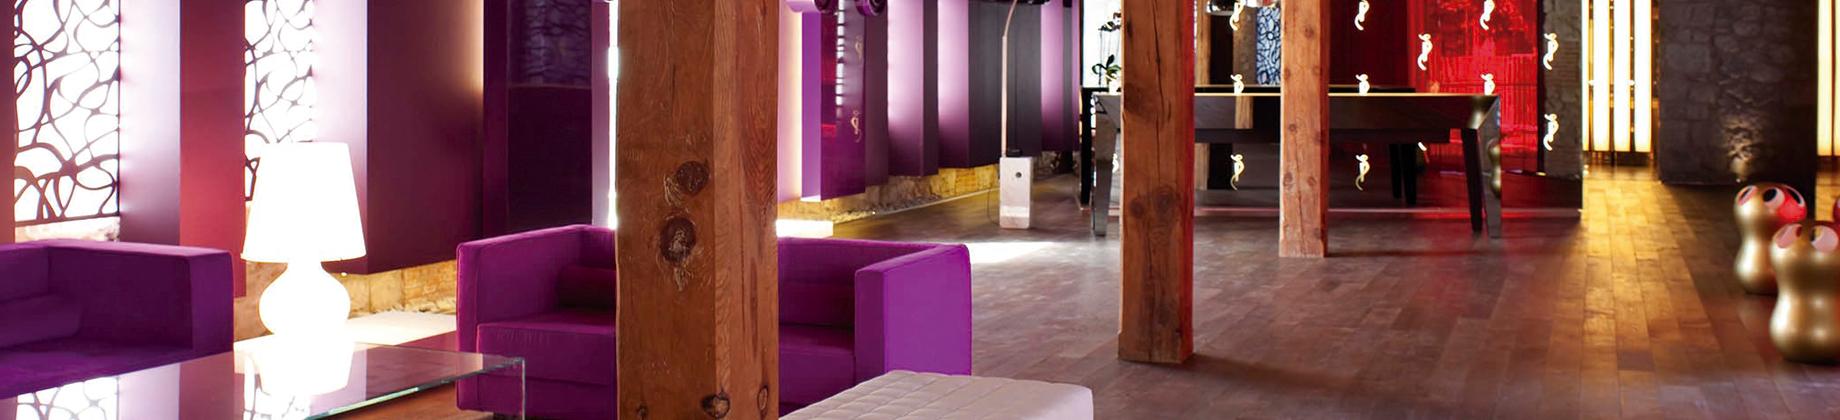 AF Hotel Pesquera